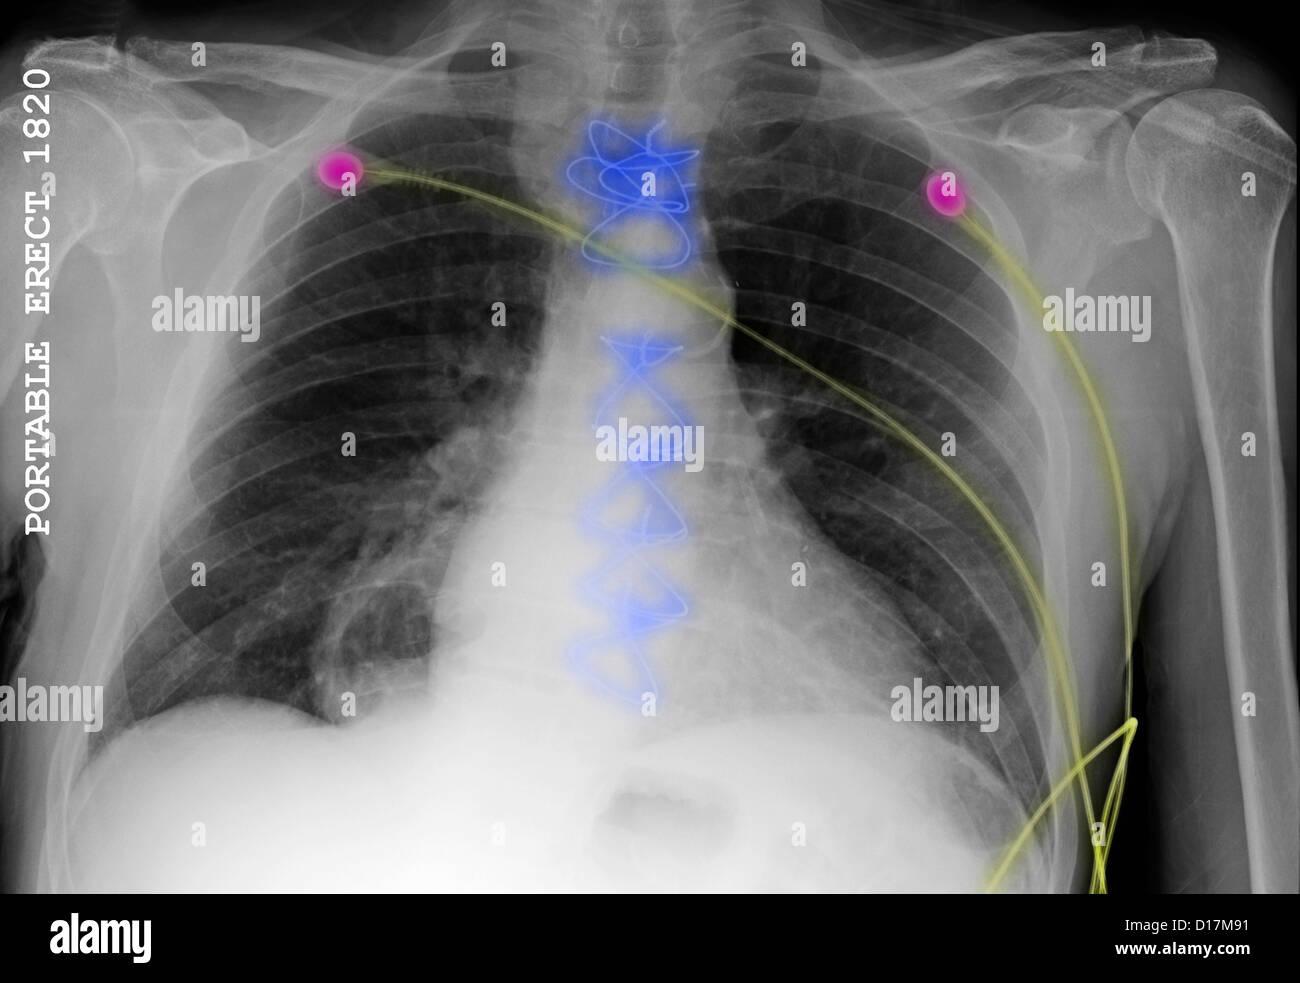 CXR of heart surgery, monitor leads, hiatal hernia - Stock Image